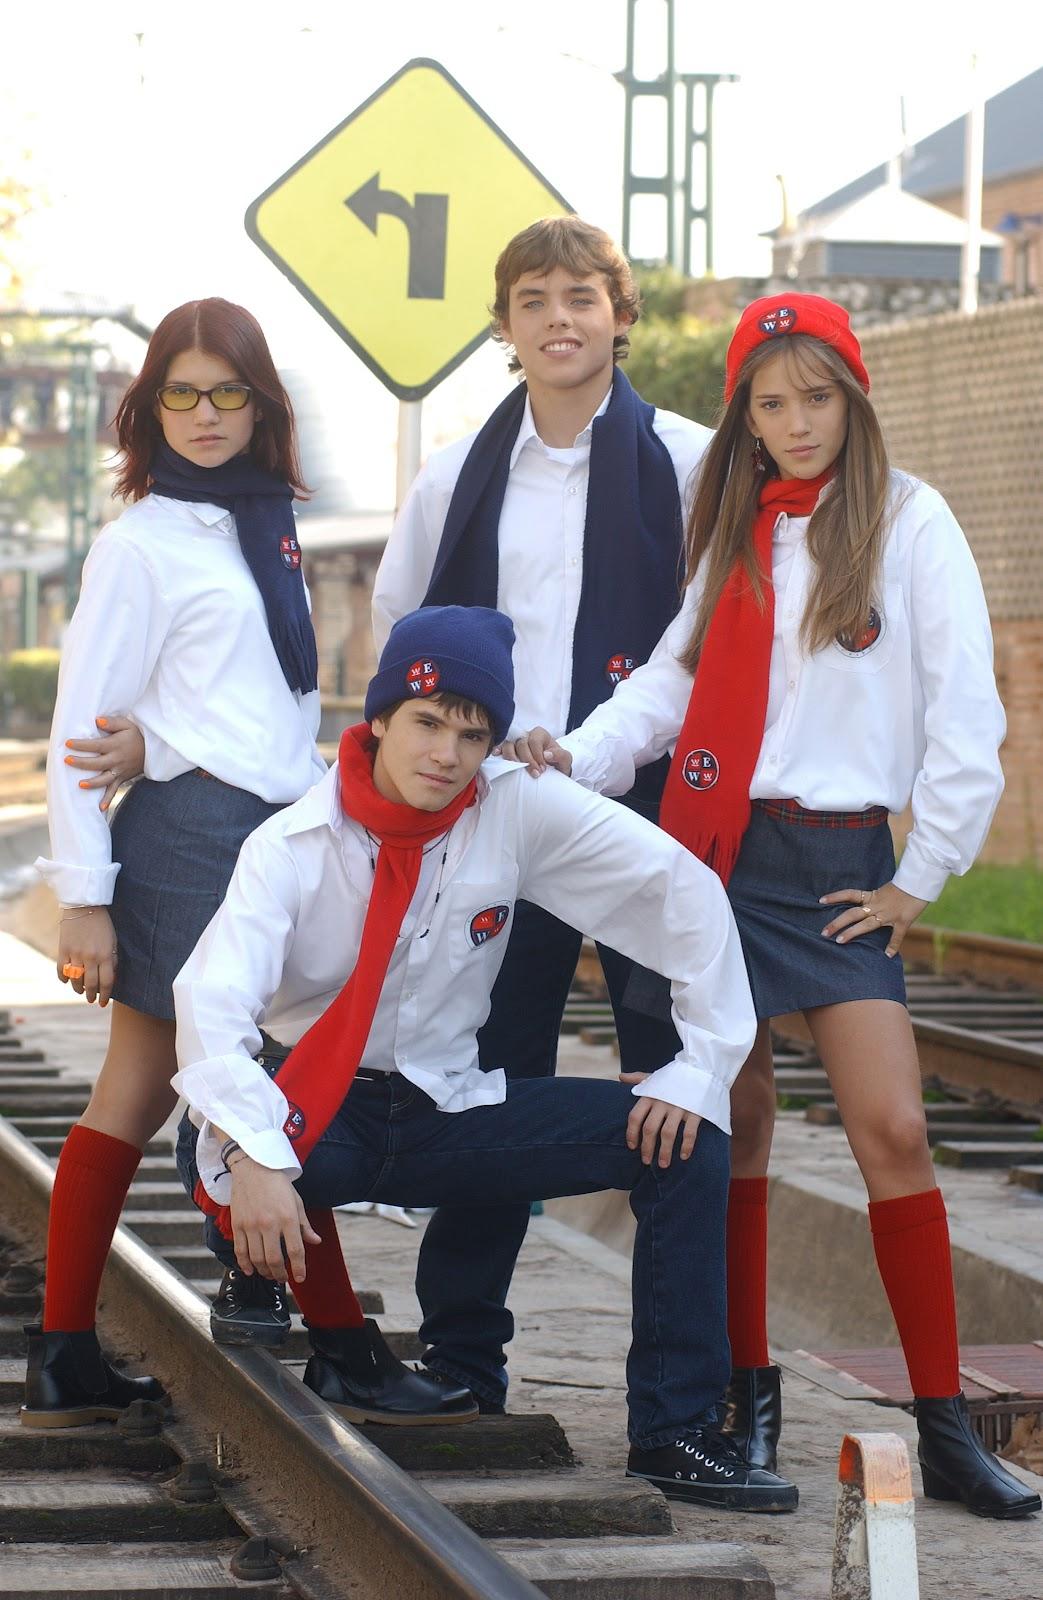 Rebelde Season 2